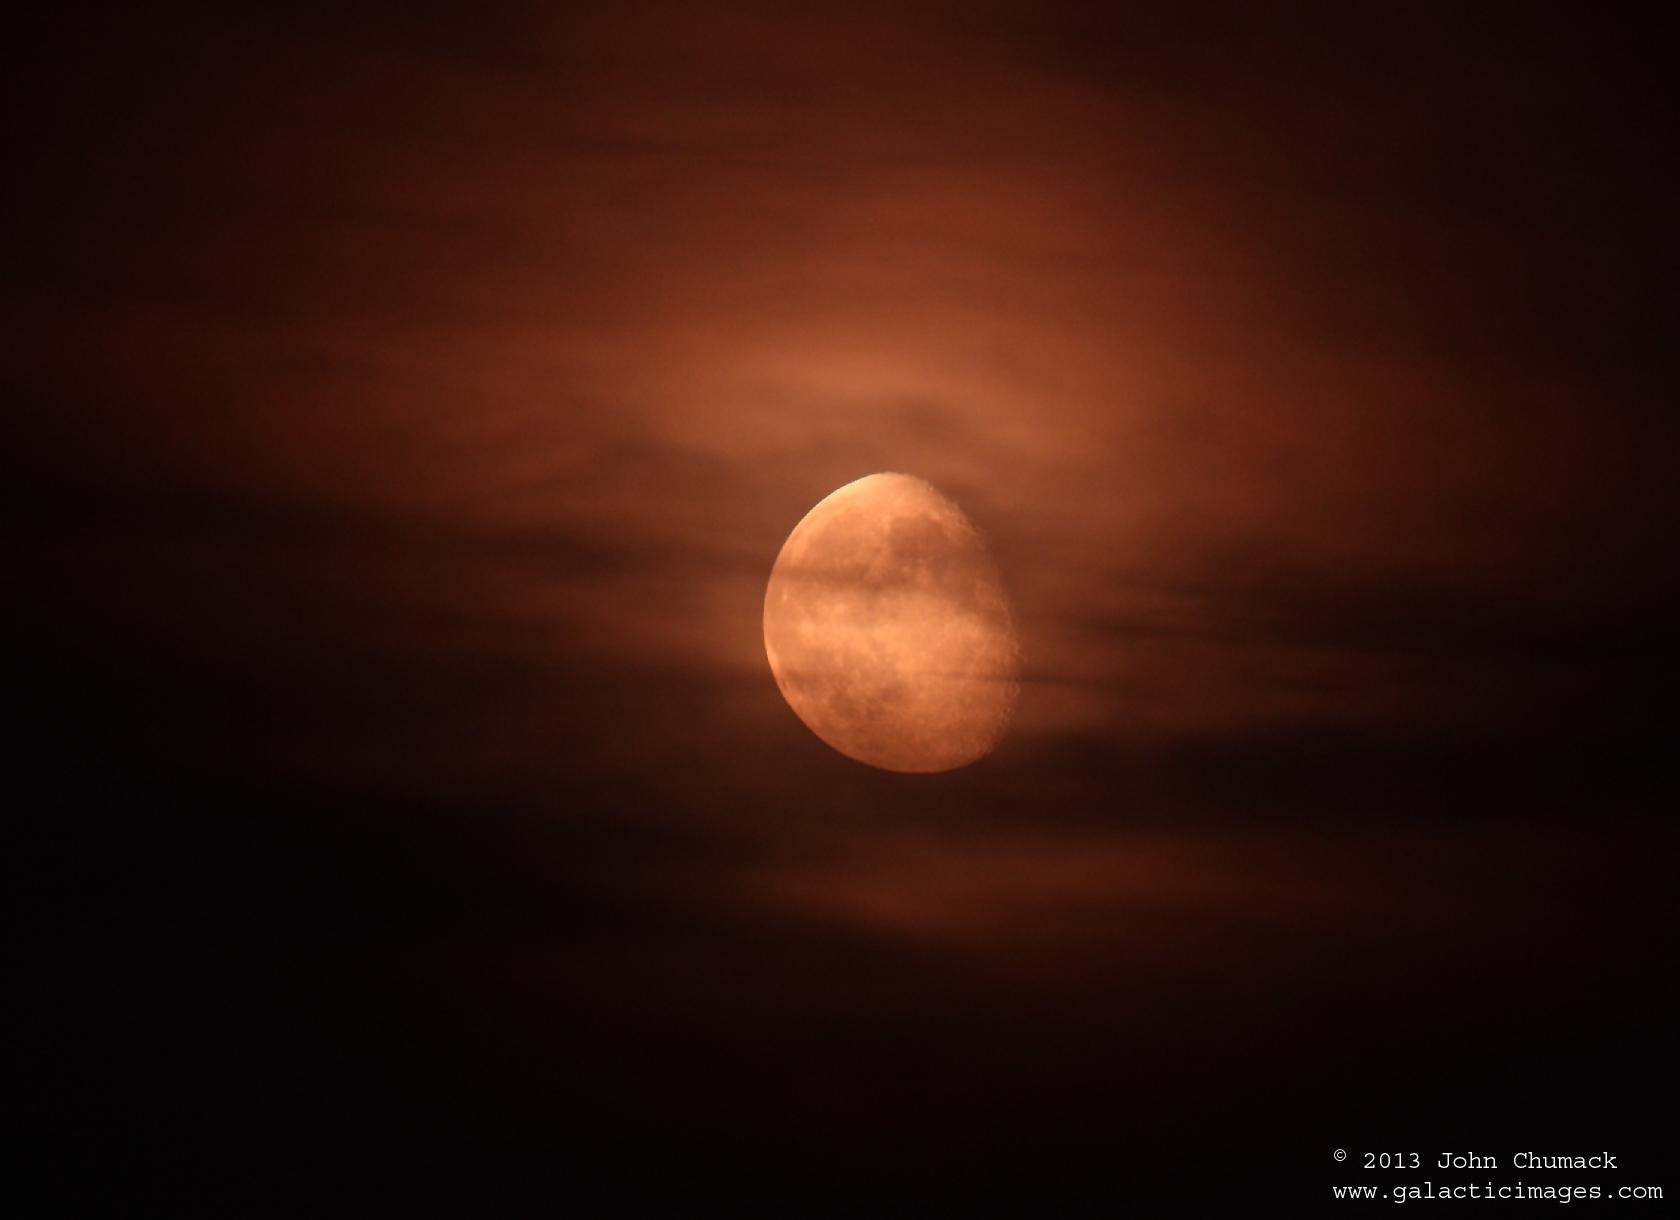 Hazy Gibbous Moon Glows Over Canada (Photo)